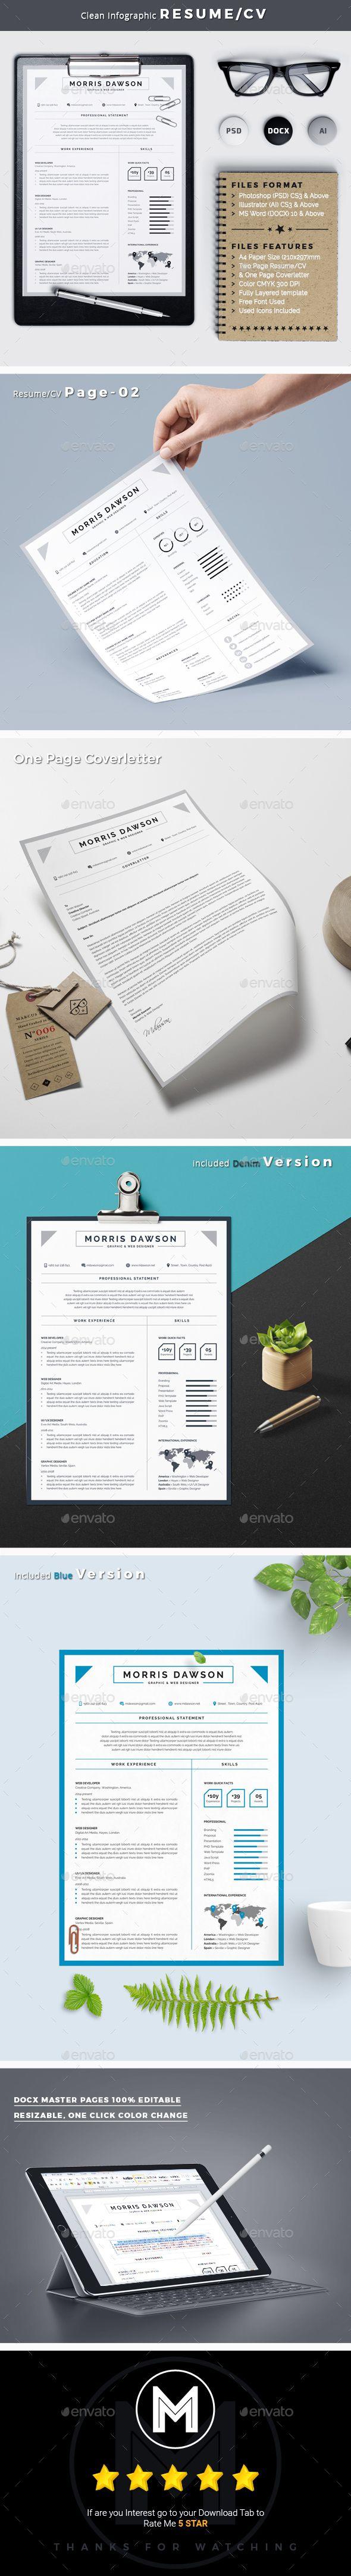 Microsoft Word Templates Cv%0A Clean Infographic Resume CV